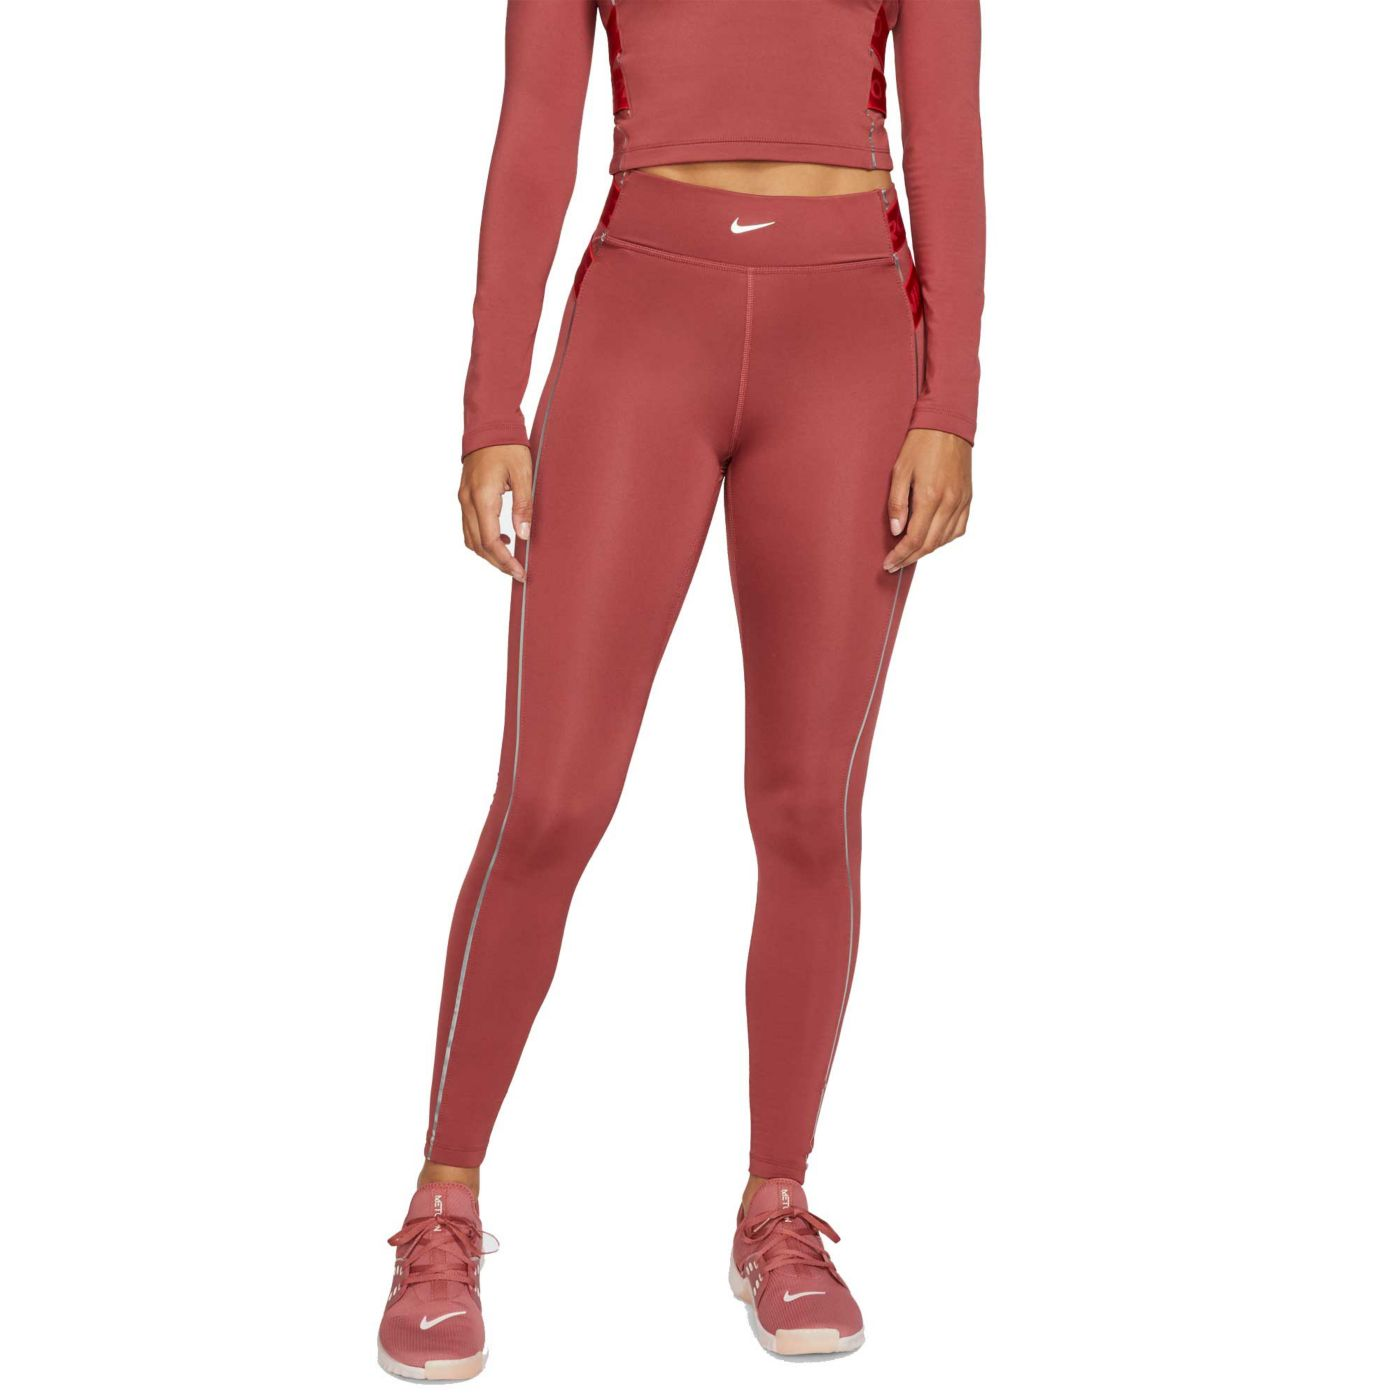 Nike Pro Women's HyperWarm Tights